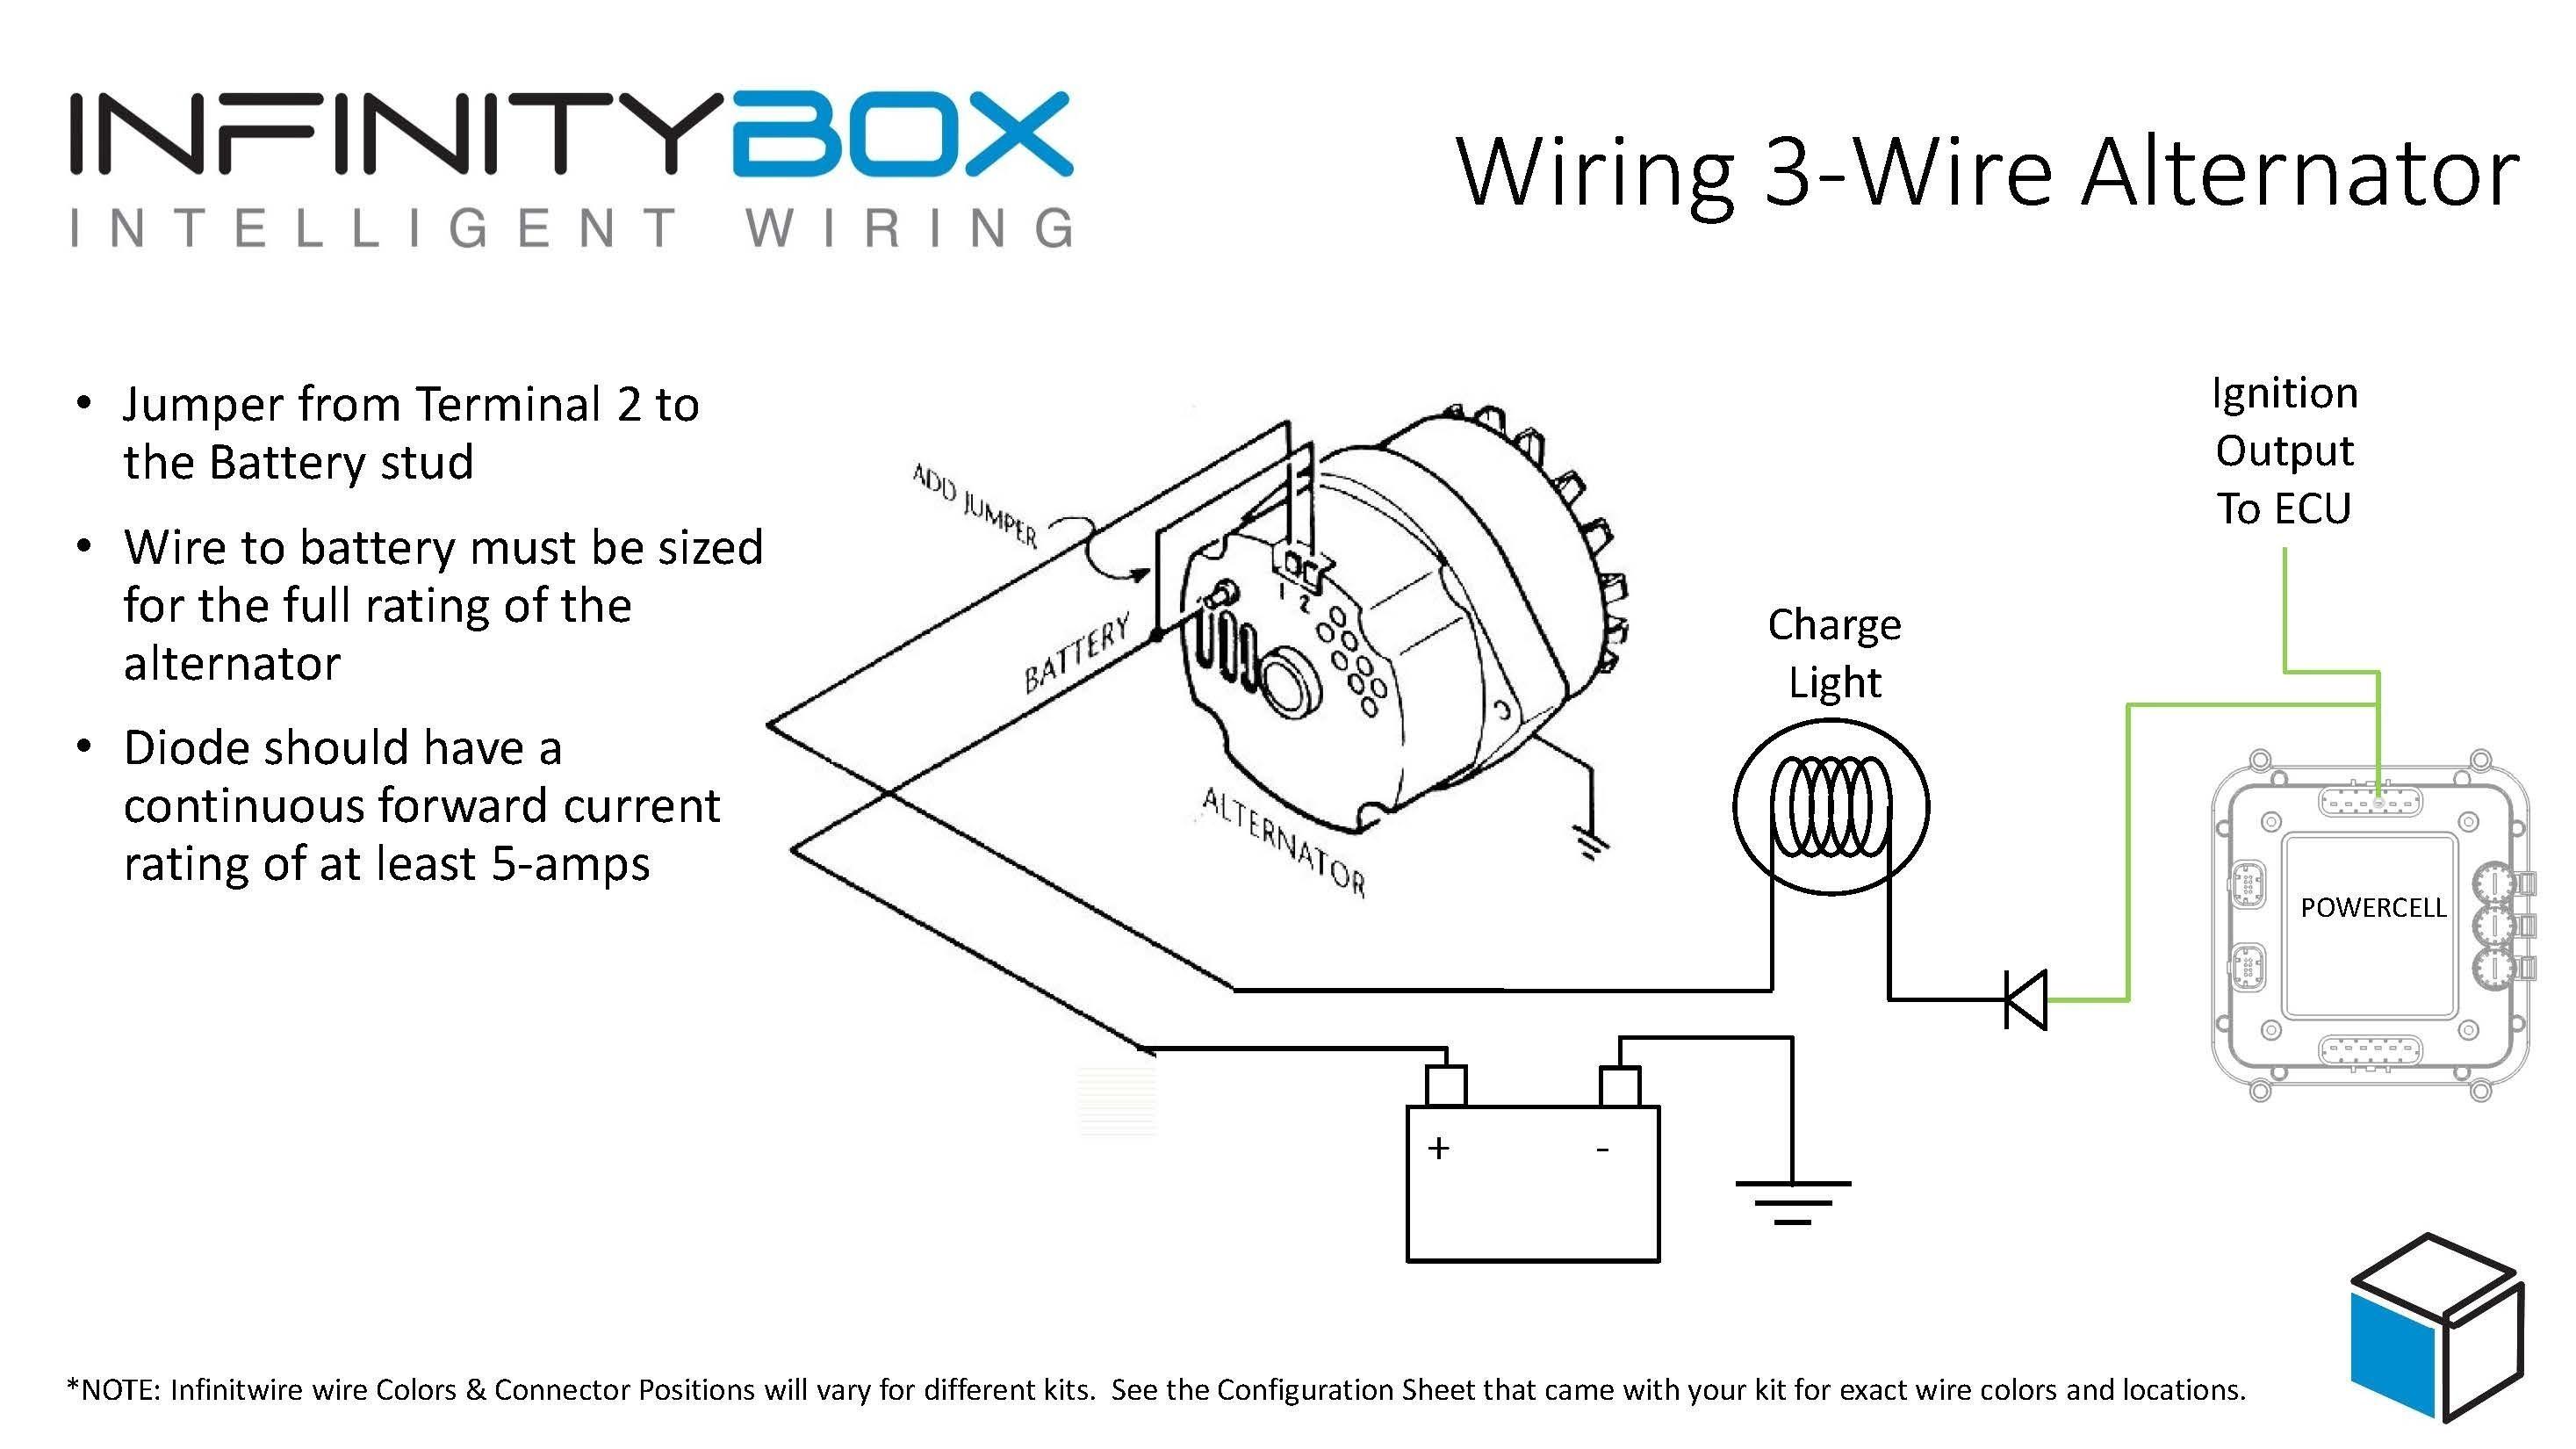 Iskra Alternator Wiring Diagram Wiring Diagram Alternator ford New Gm Internal Regulator Wiring Of Iskra Alternator Wiring Diagram